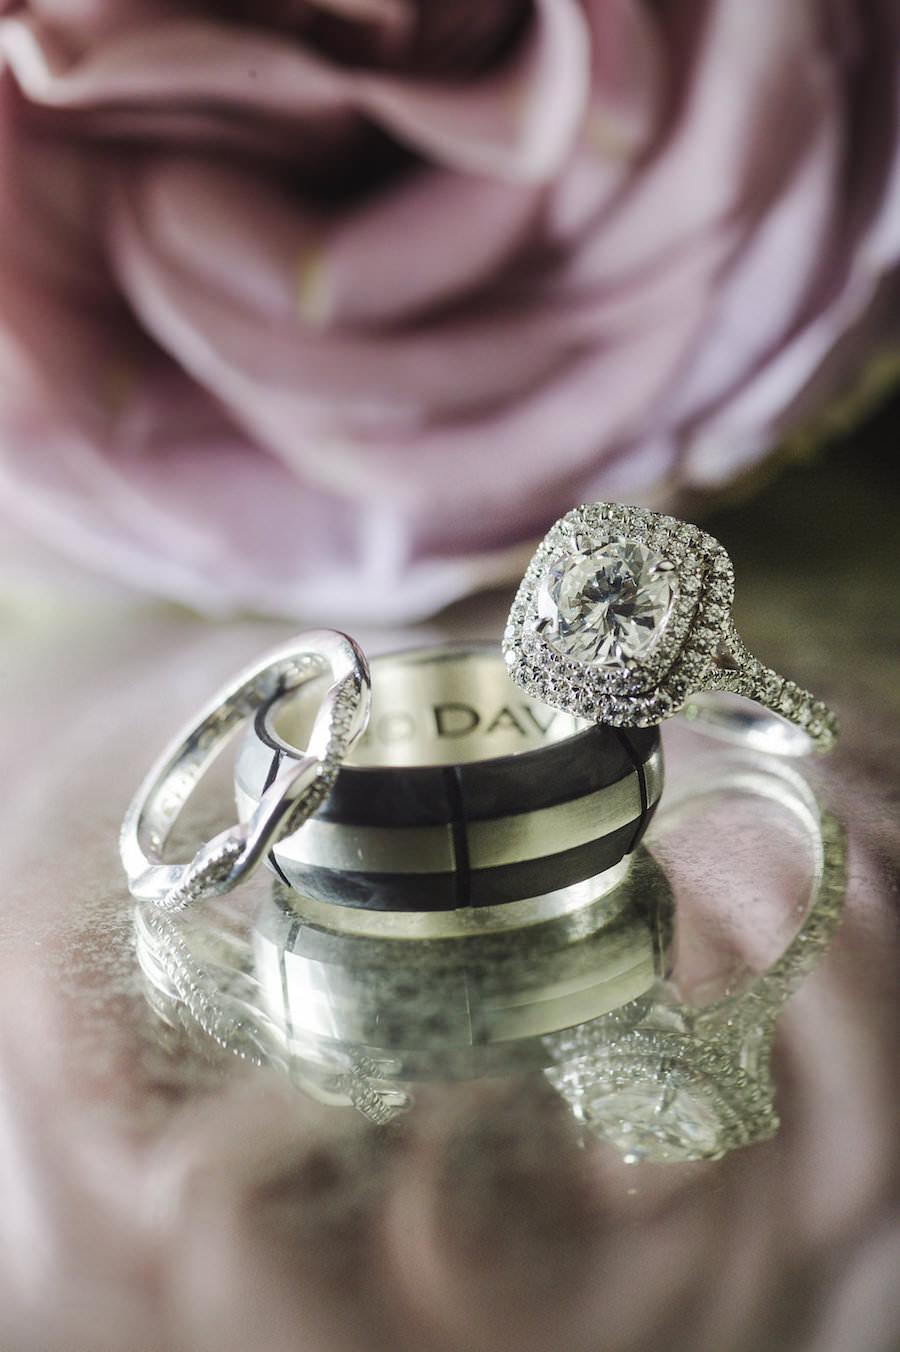 Halo Cushion Cut Engagement Wedding Ring and Black Groom Band